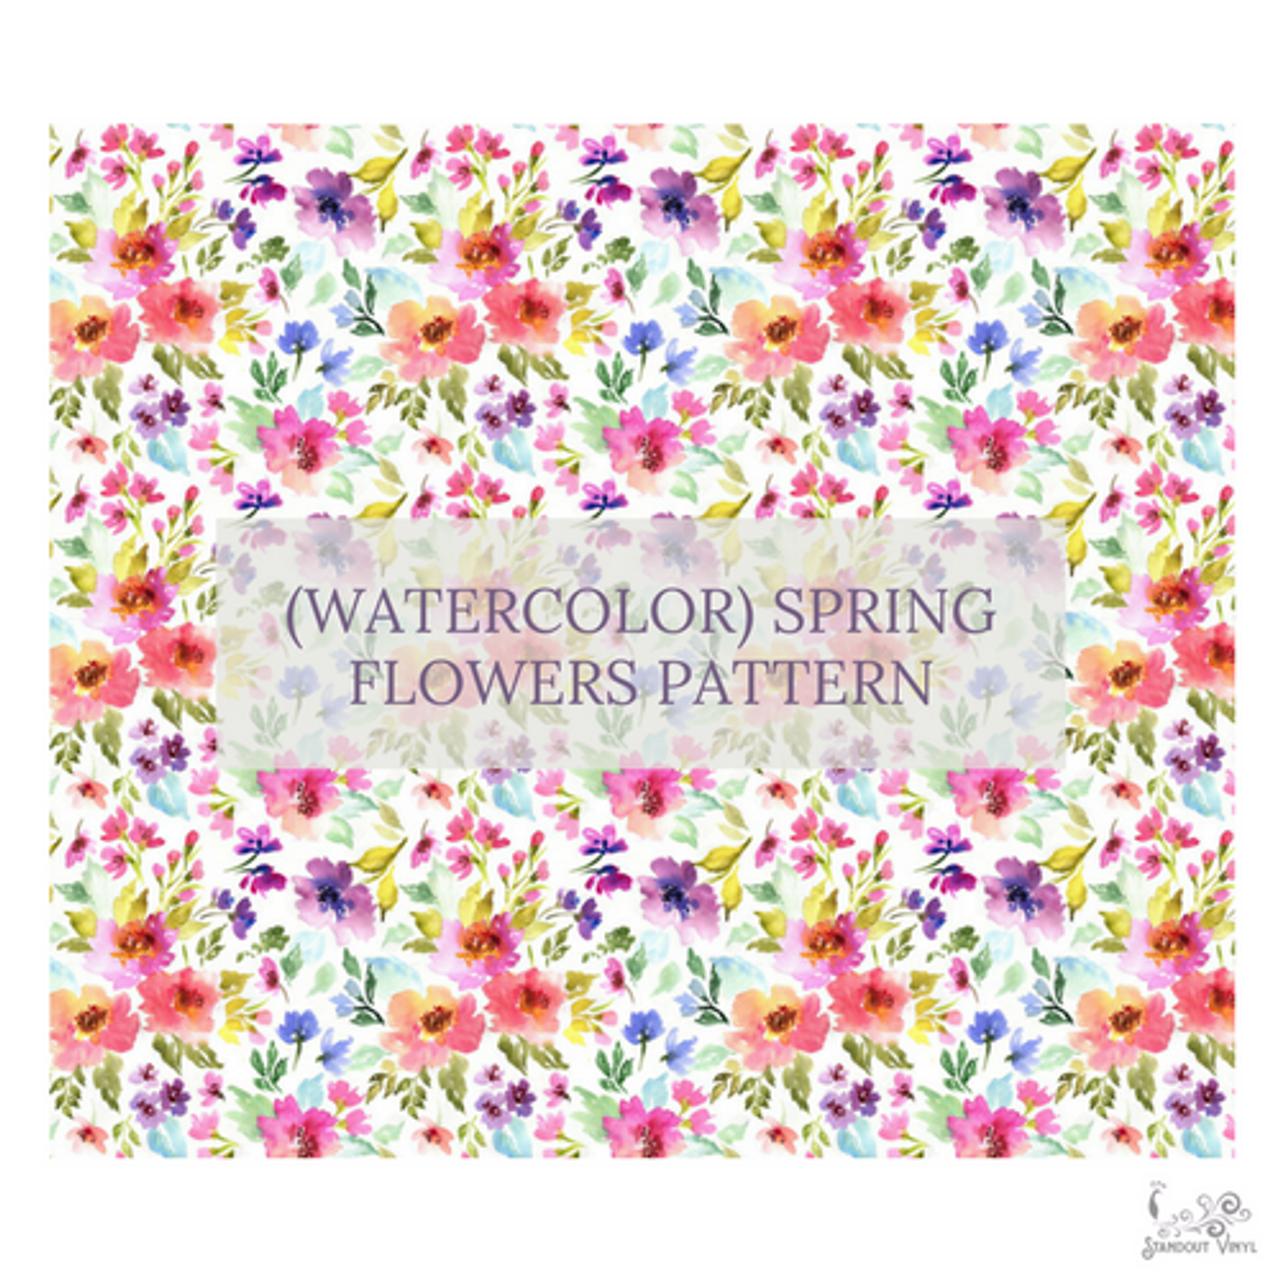 Spring Flowers Patterned Vinyl Choose Adhesive Or Htv Standout Vinyl